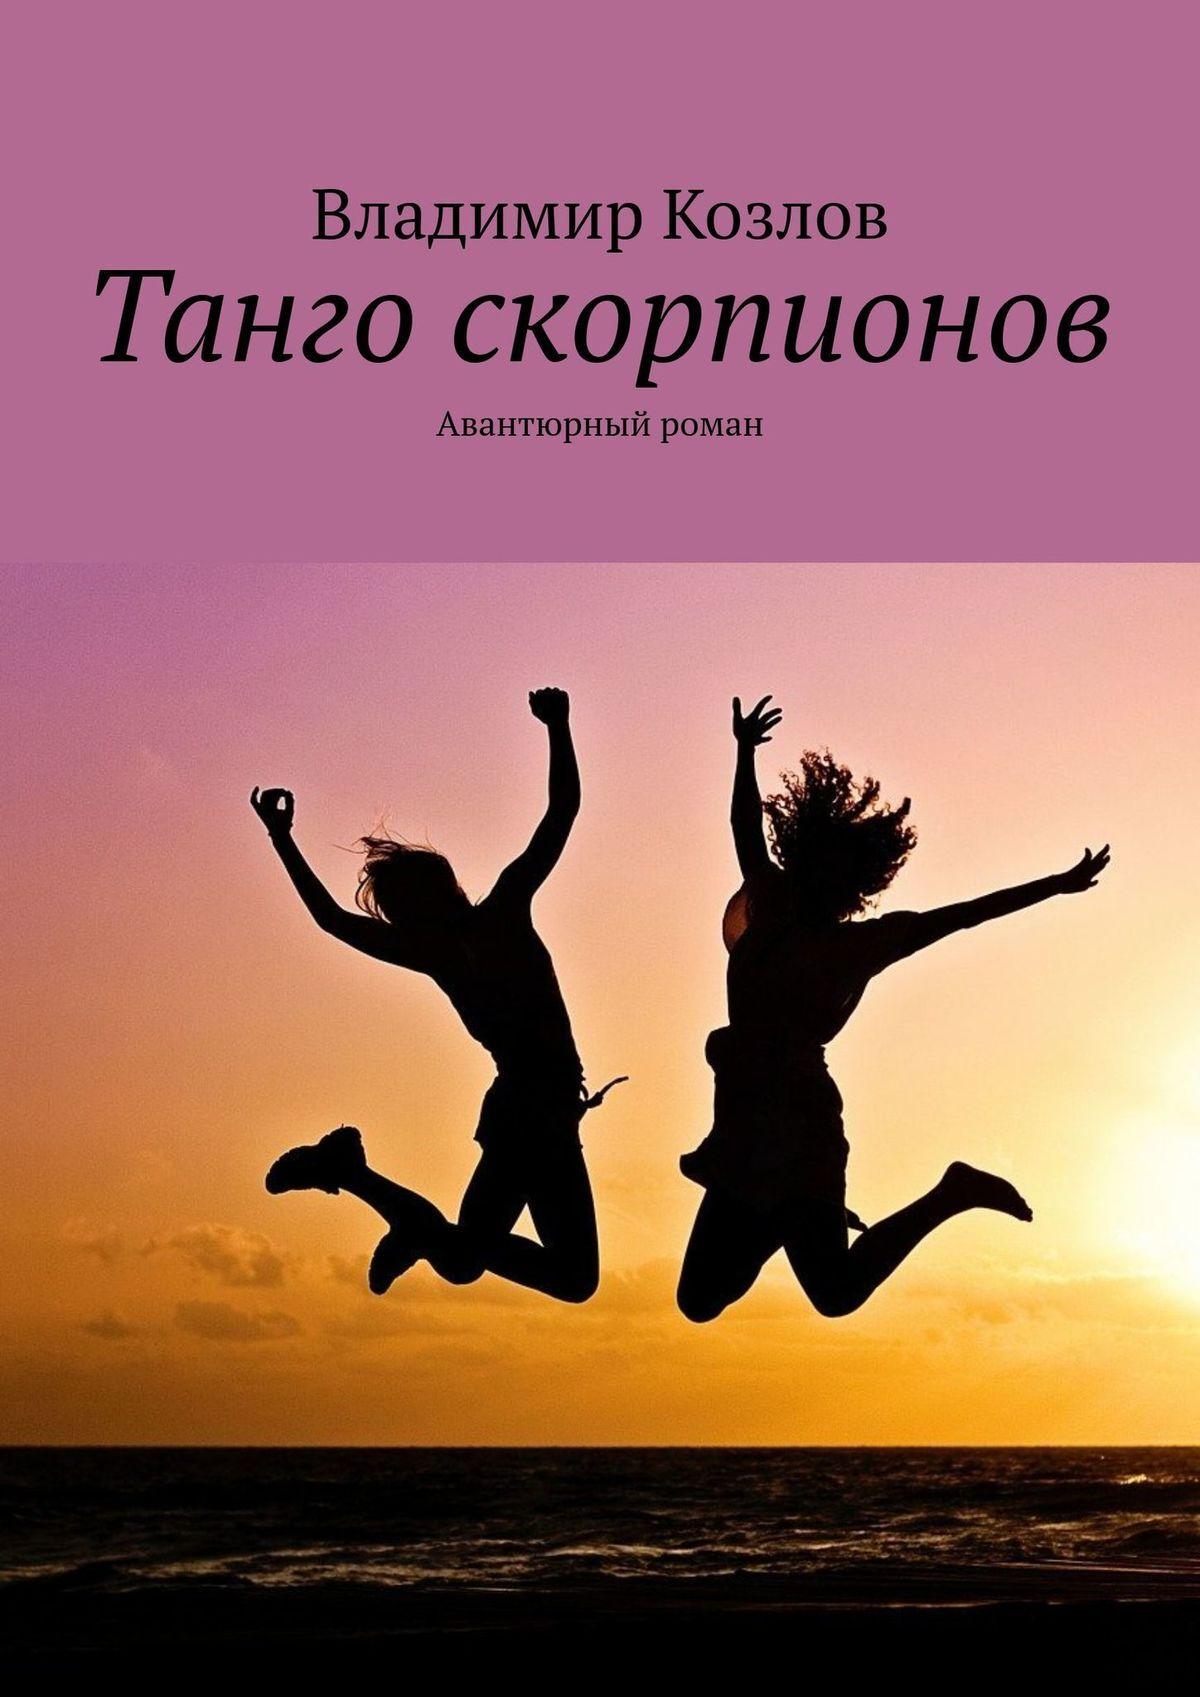 Танго скорпионов. Авантюрный роман для взрослых